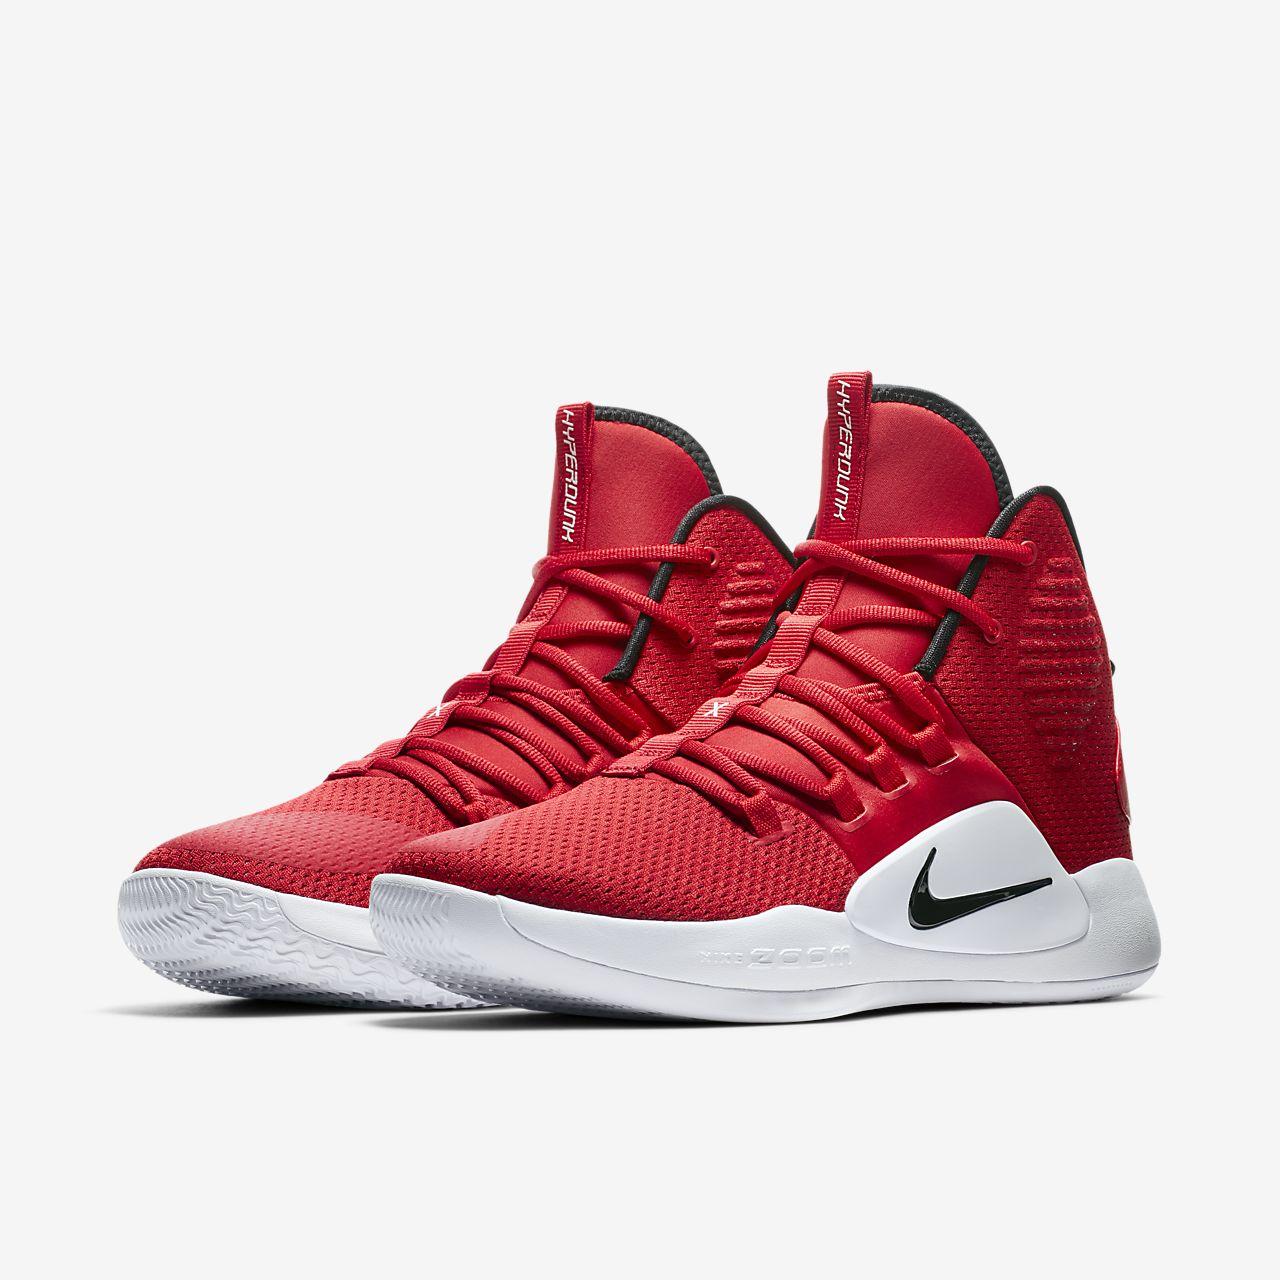 d102943f3296 Nike Hyperdunk X TB Basketball Shoe. Nike.com